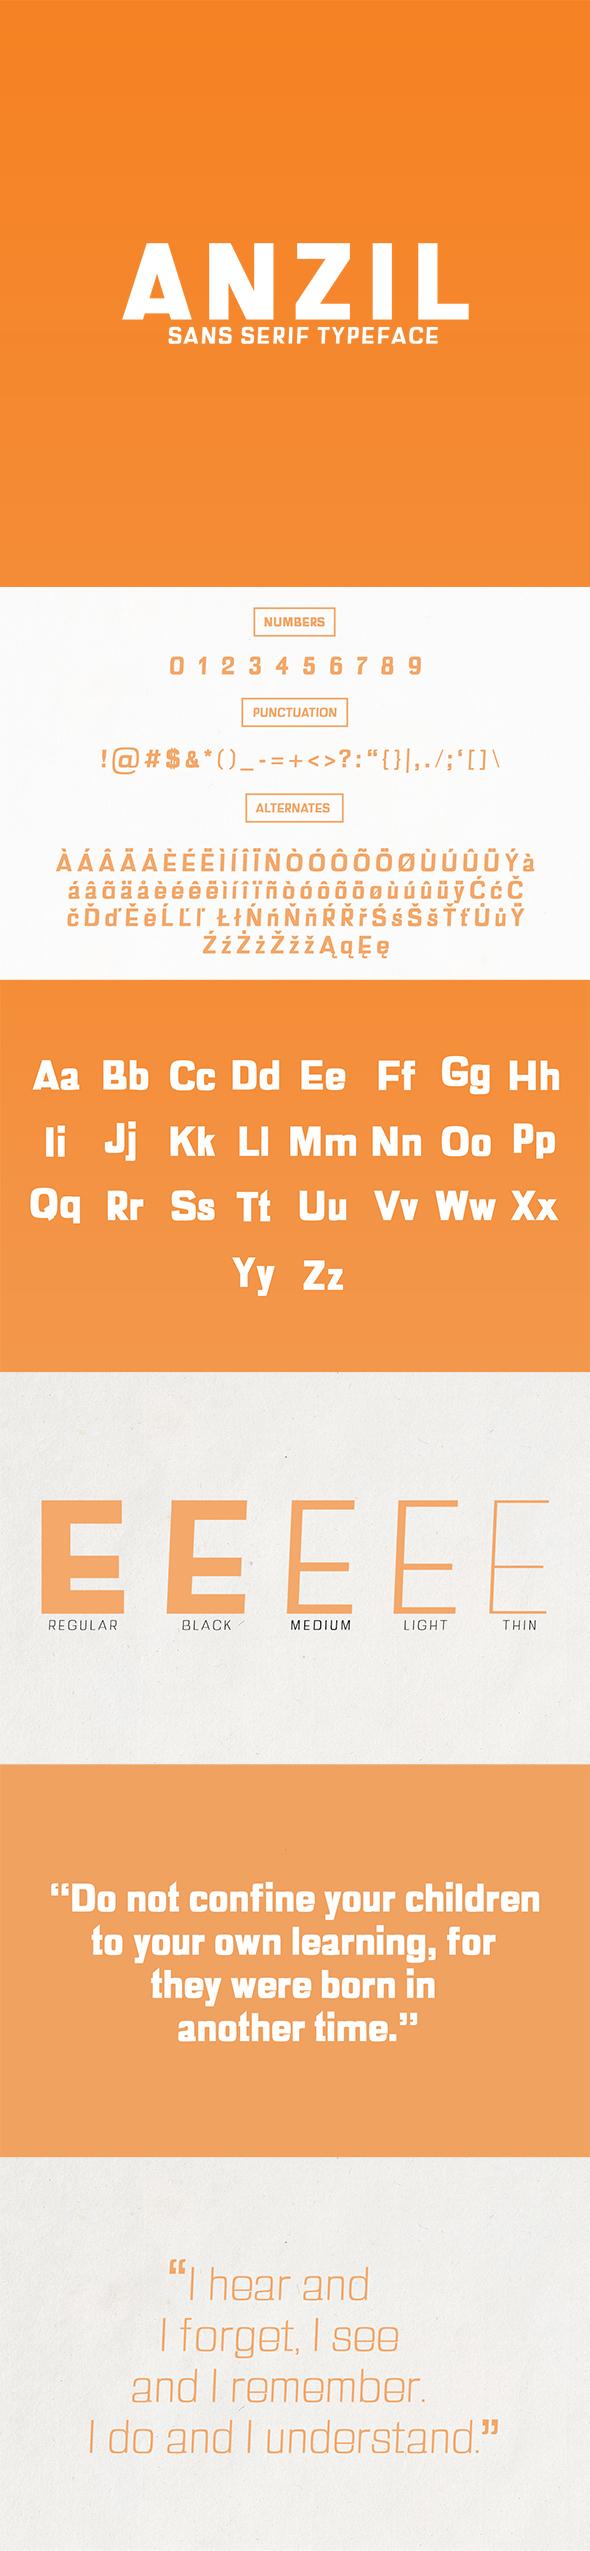 Anzil Sans Serif Font Family - Sans-Serif Fonts